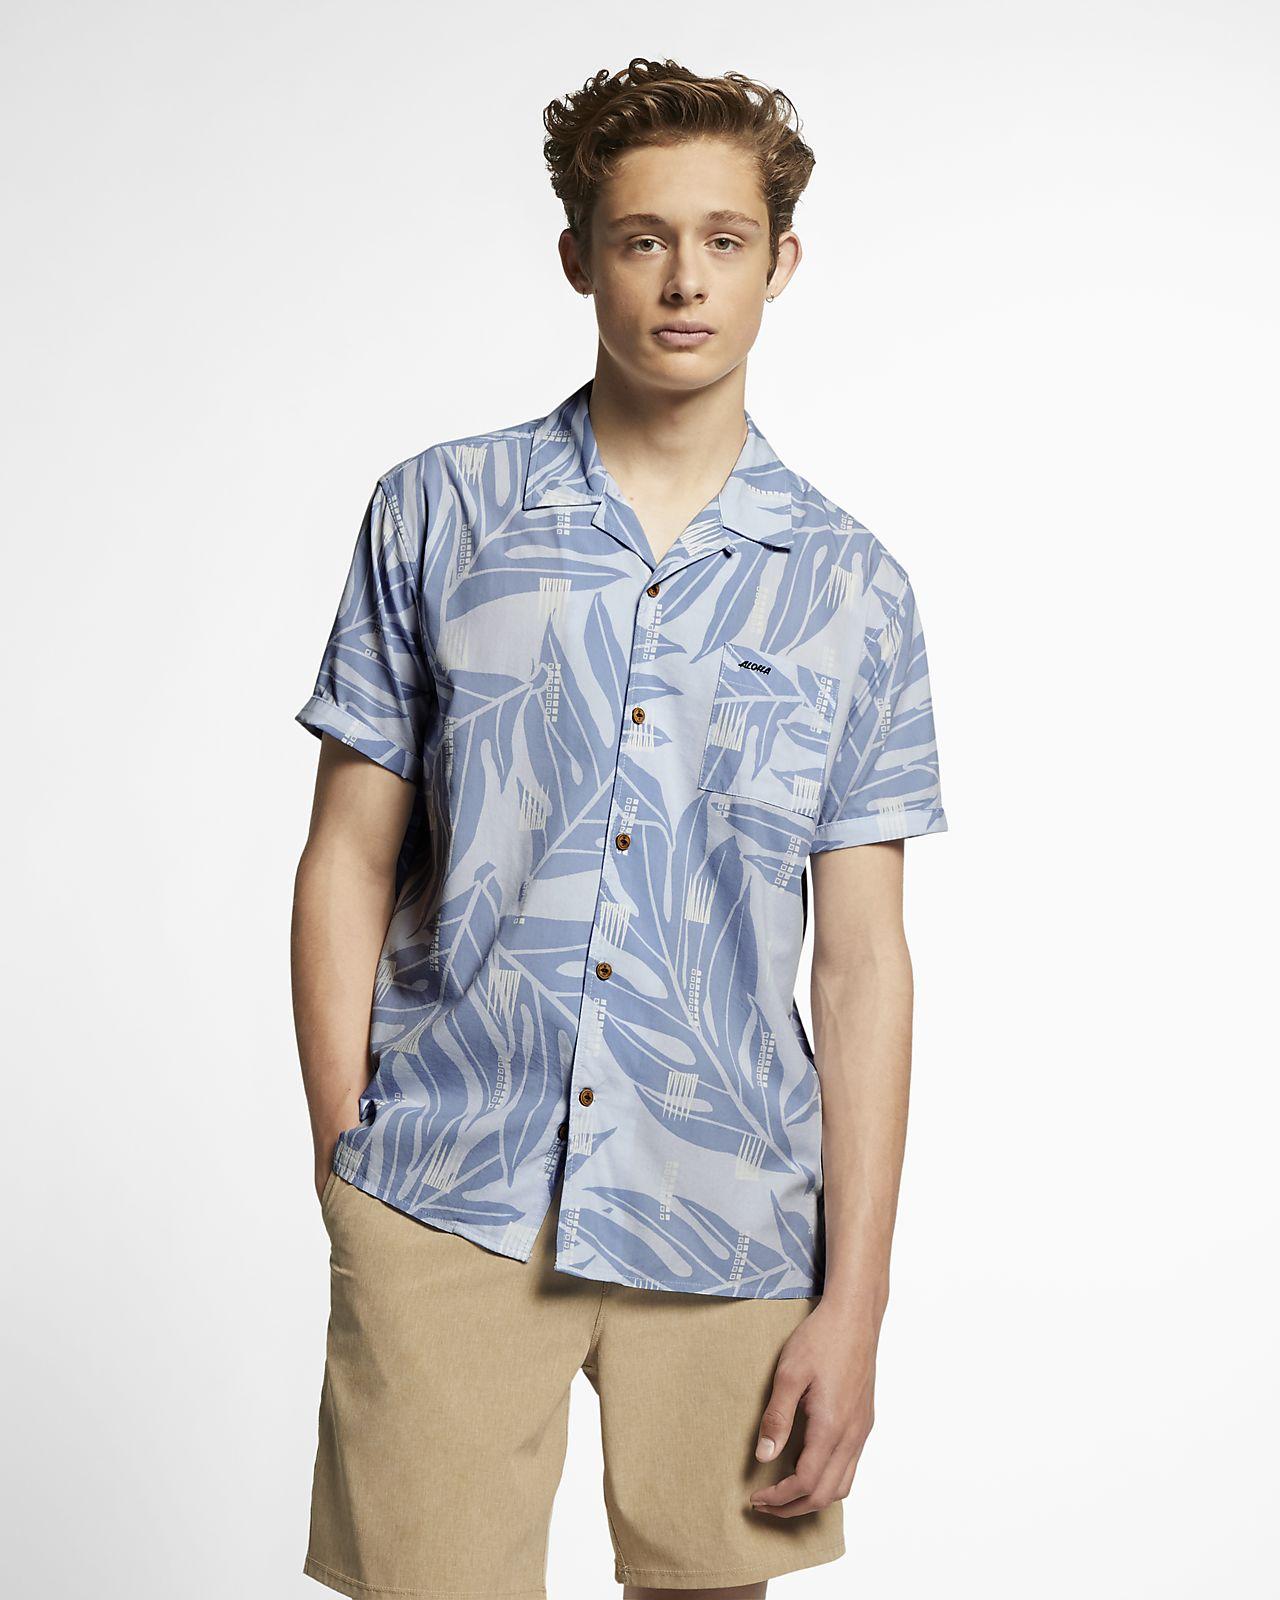 Hurley Sig Zane Maloulu Men's Short-Sleeve Top